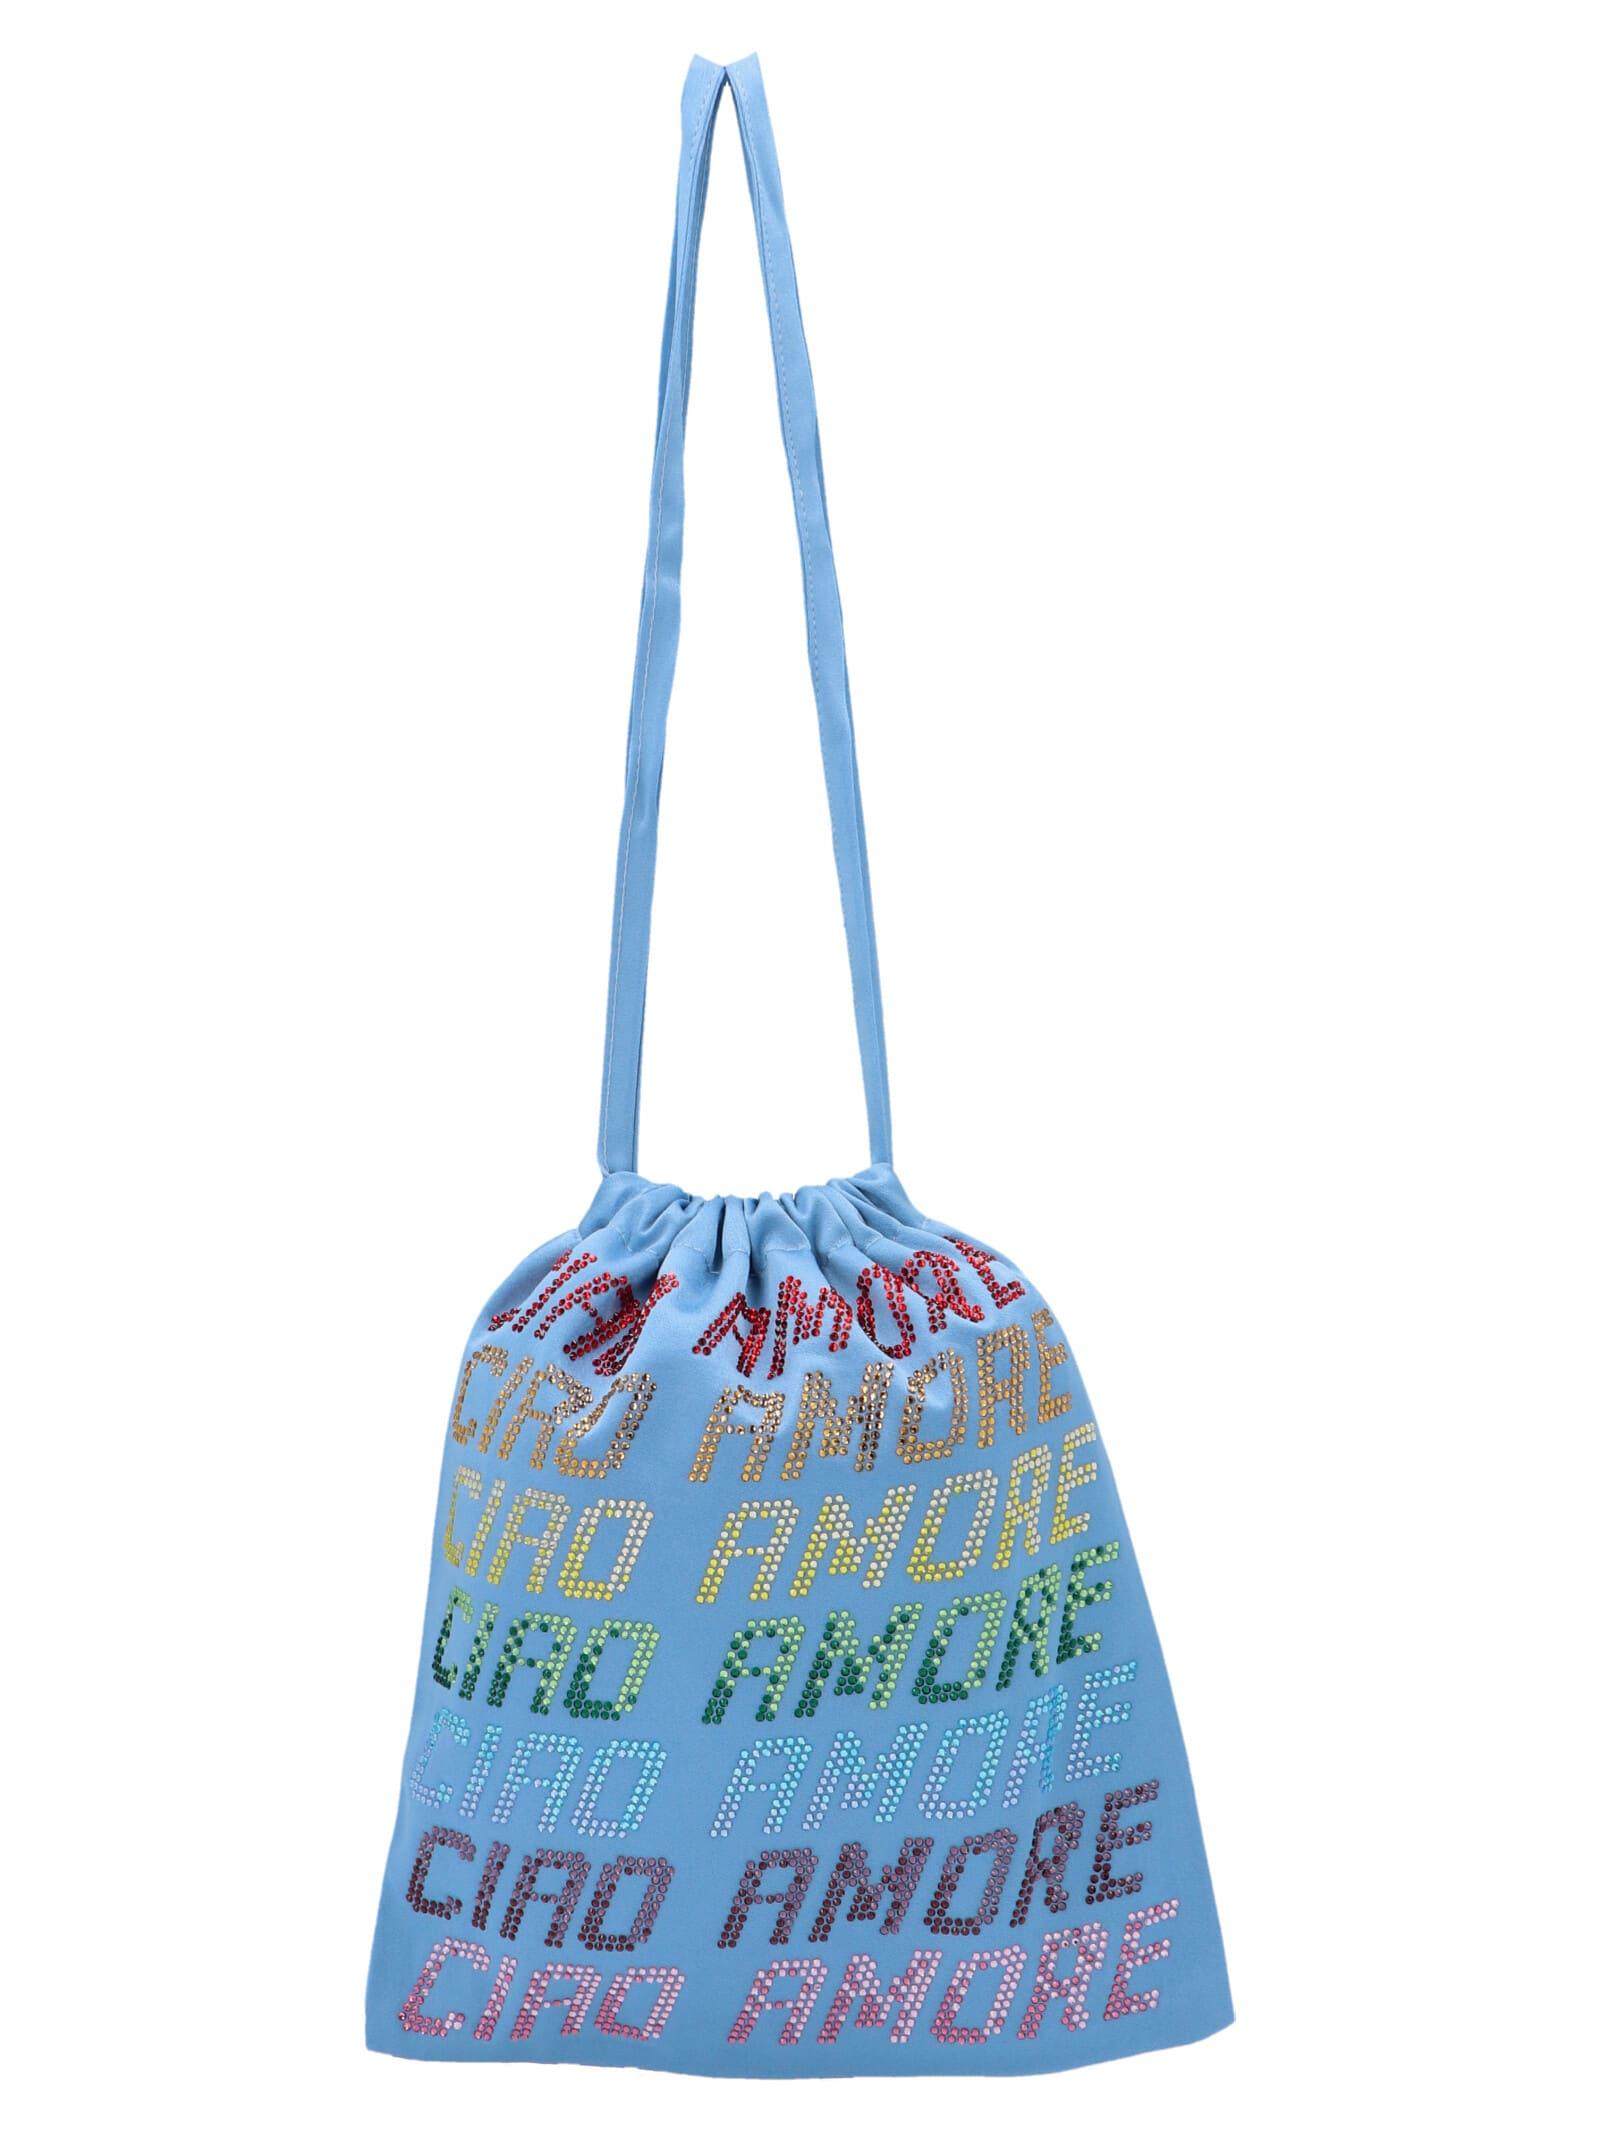 ciao Amore Bag